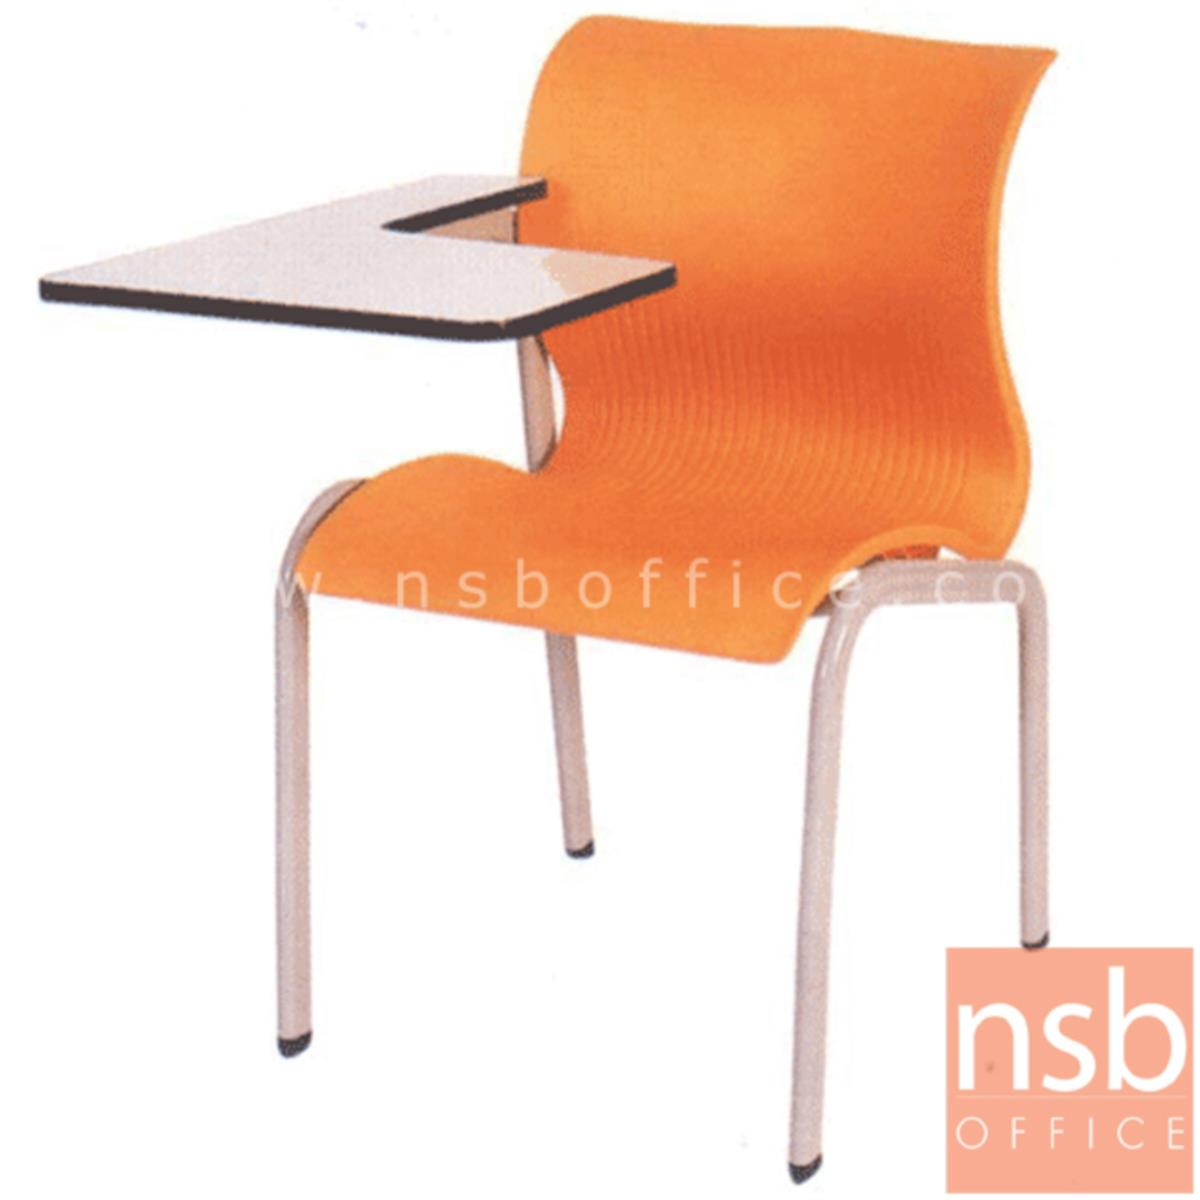 B07A047:เก้าอี้เลคเชอร์เฟรมโพลี่ รุ่น C6-701 ขาเหล็ก